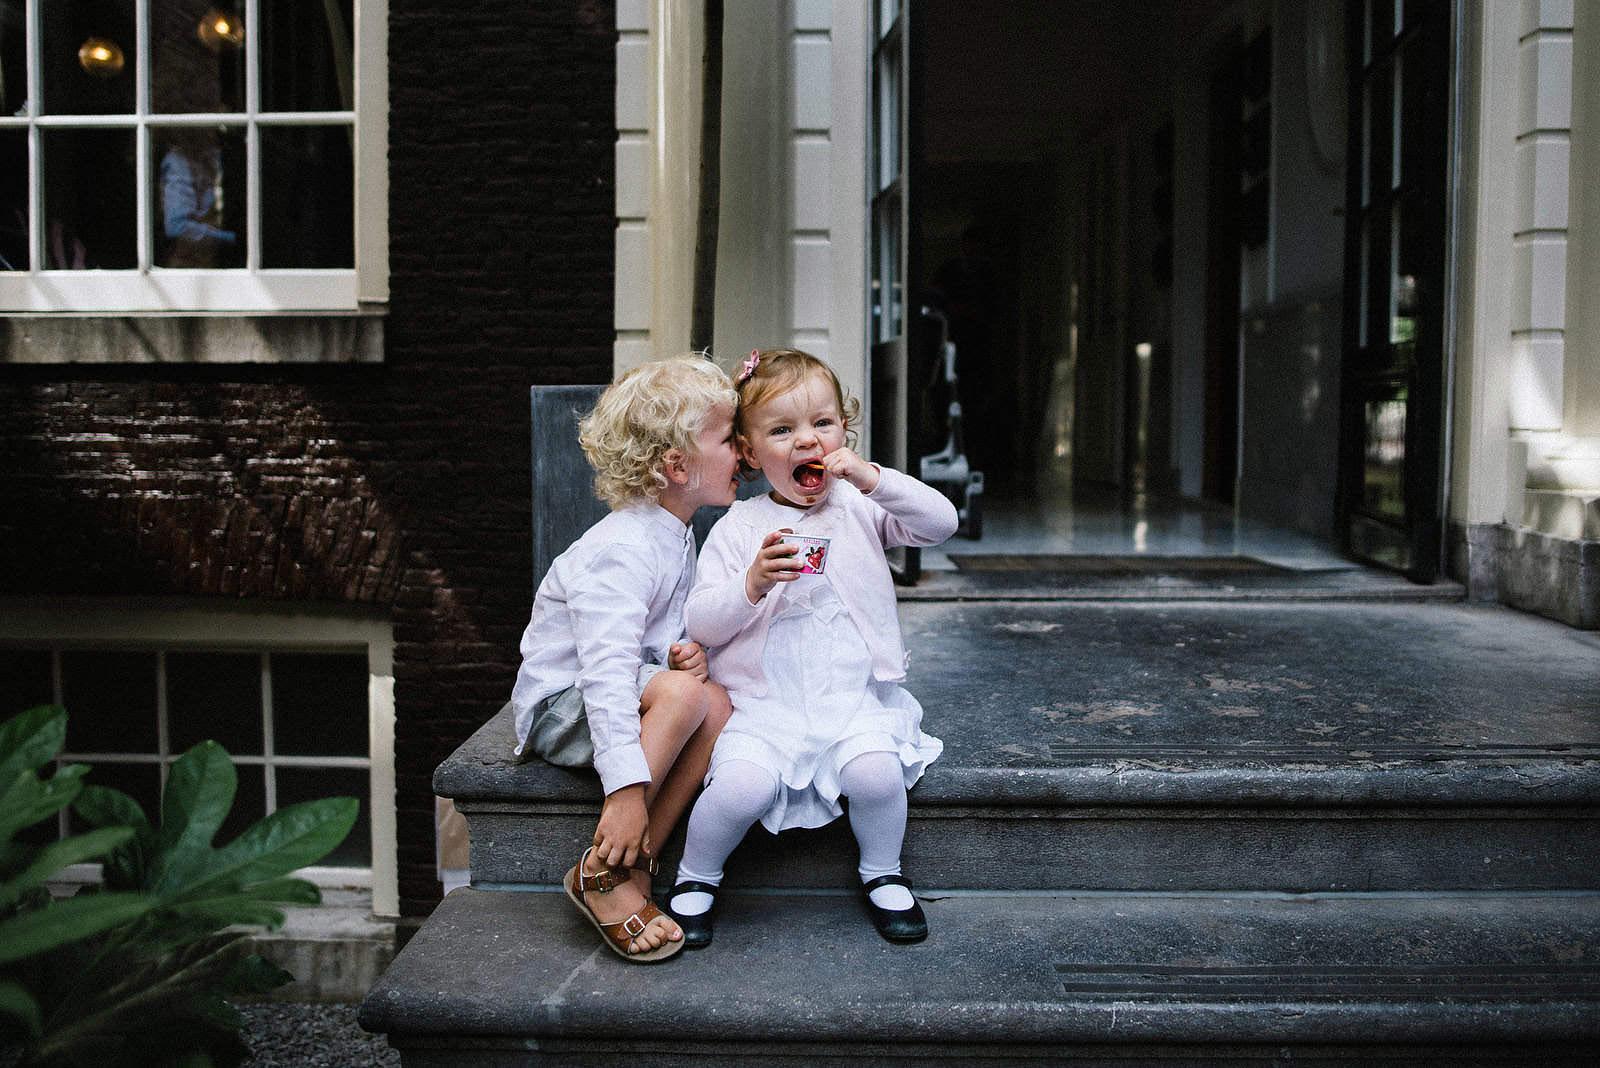 Fotograf Konstanz - Destination Wedding Photographer Amsterdam 076 - Destination Wedding Amsterdam  - 184 -